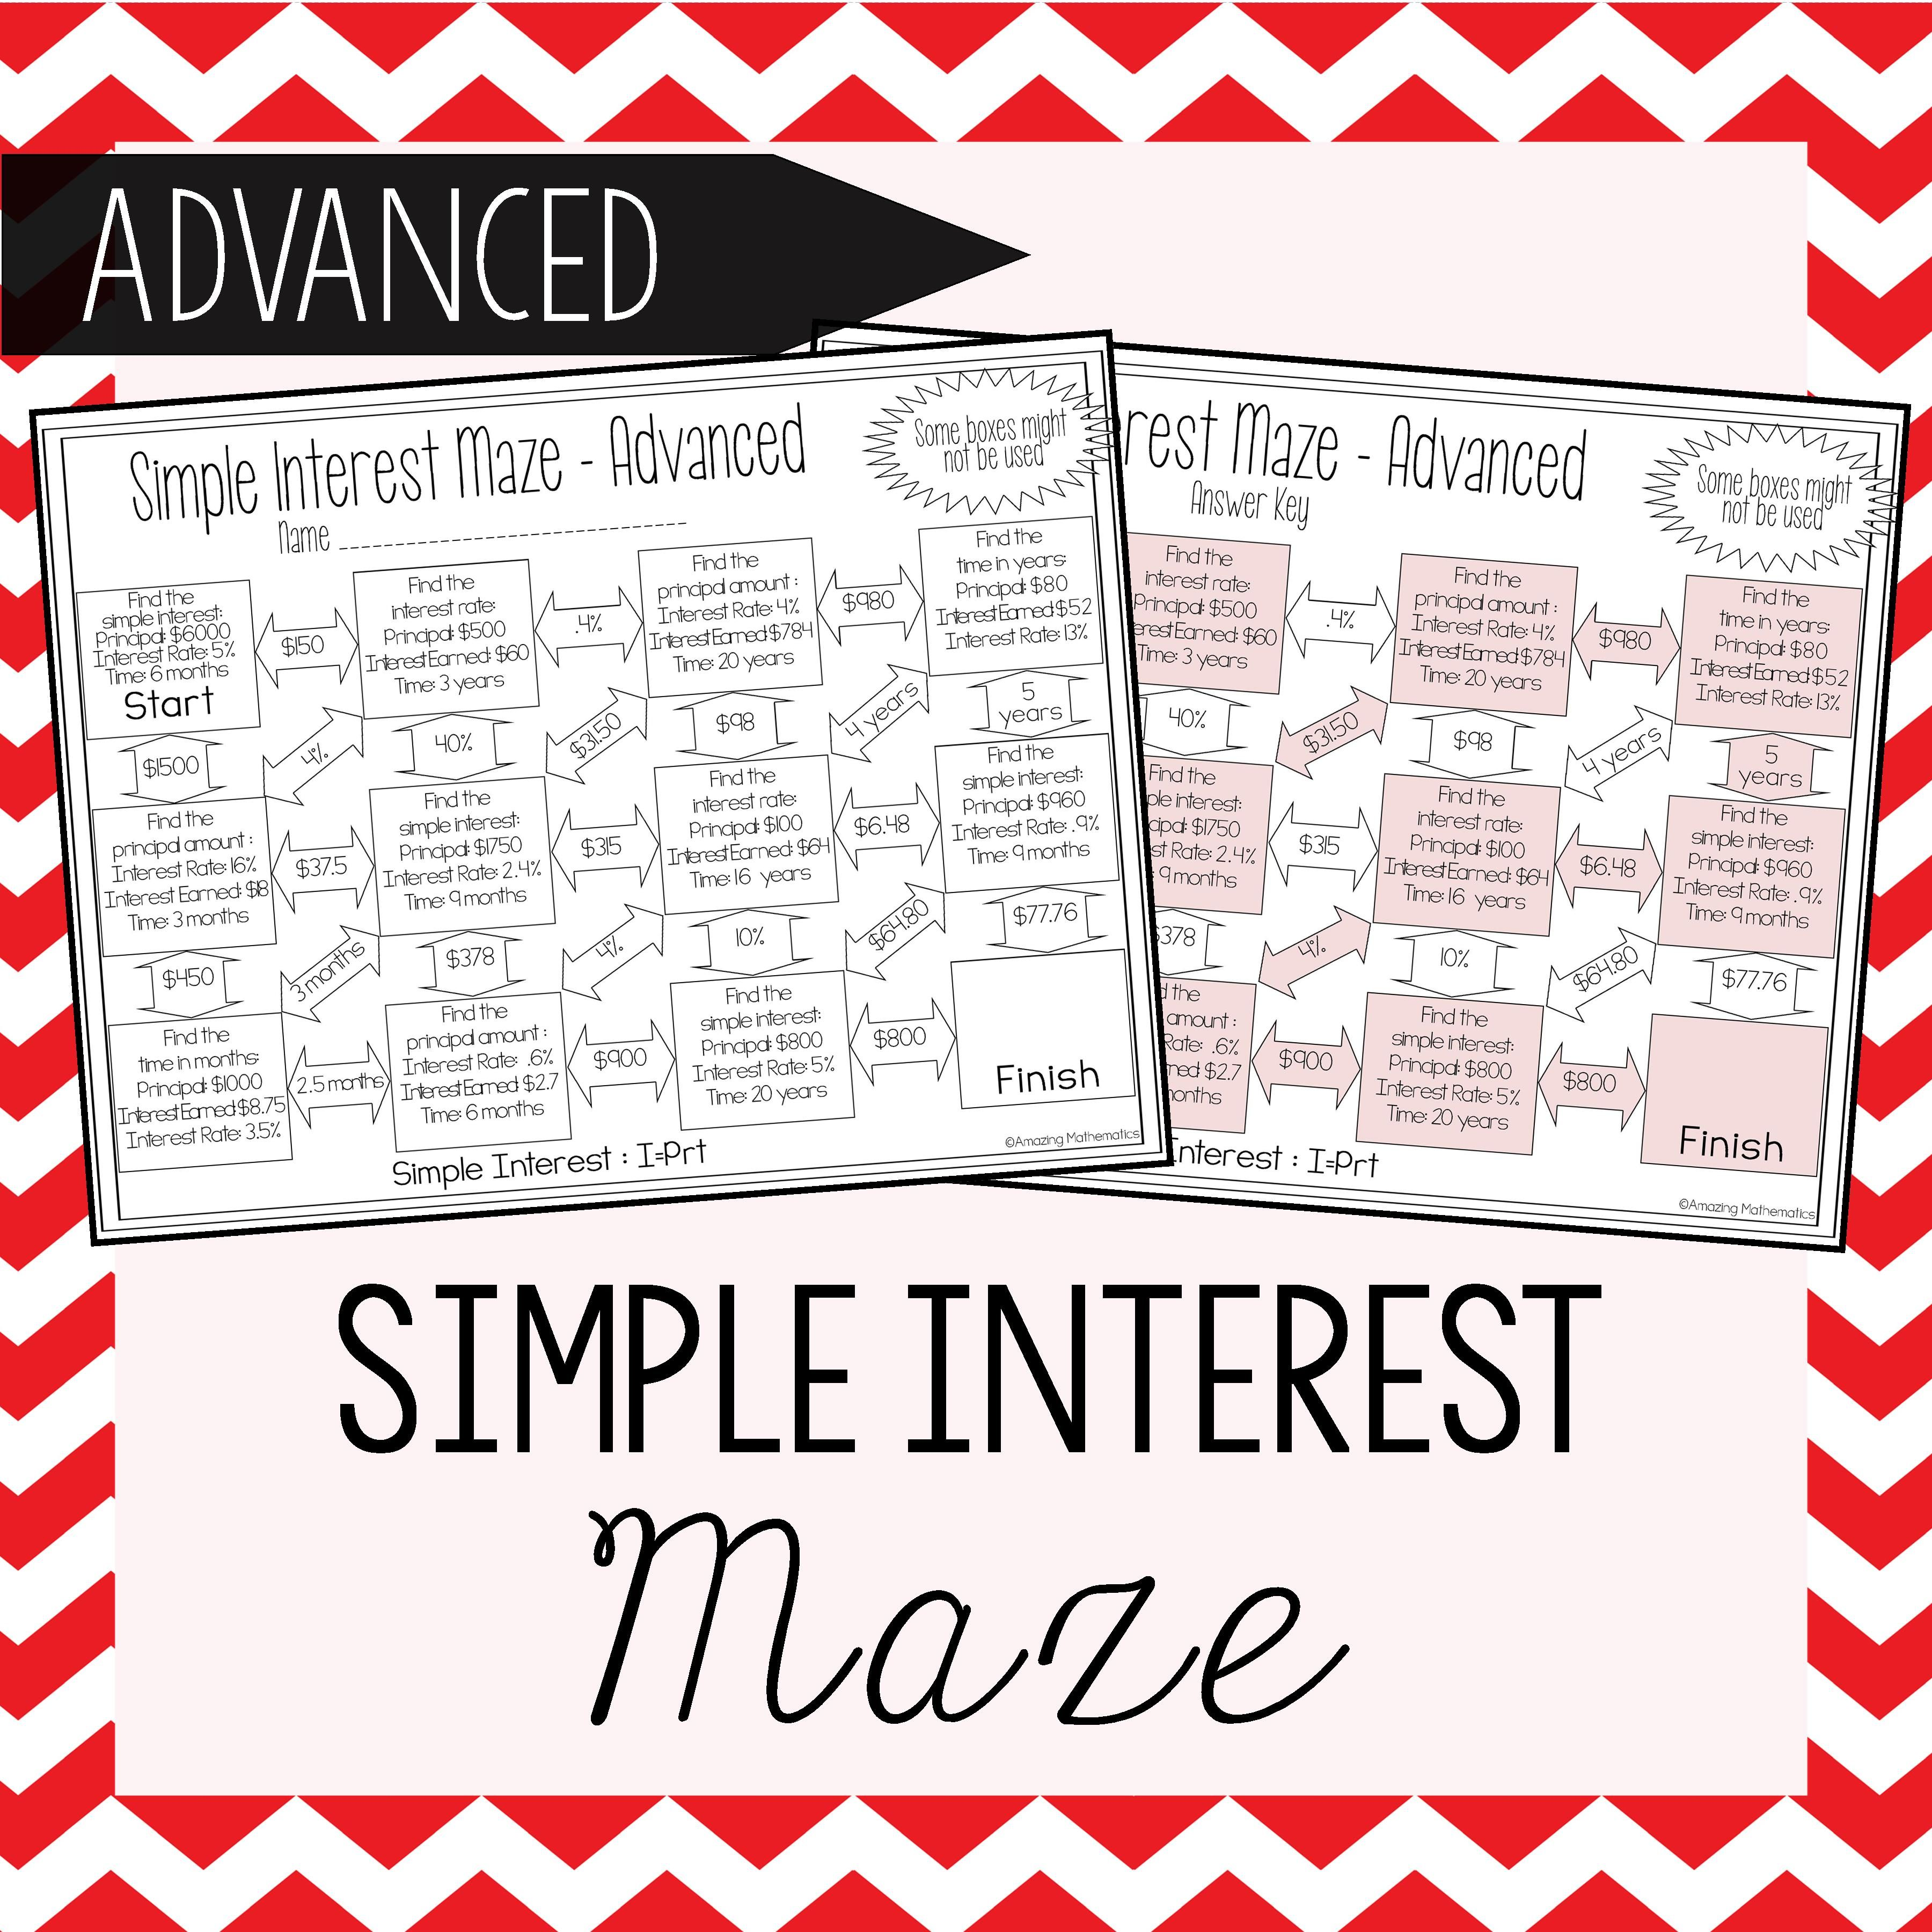 worksheet Compound Interest Practice Worksheet simple interest maze advanced 8th grade math and fun advanced